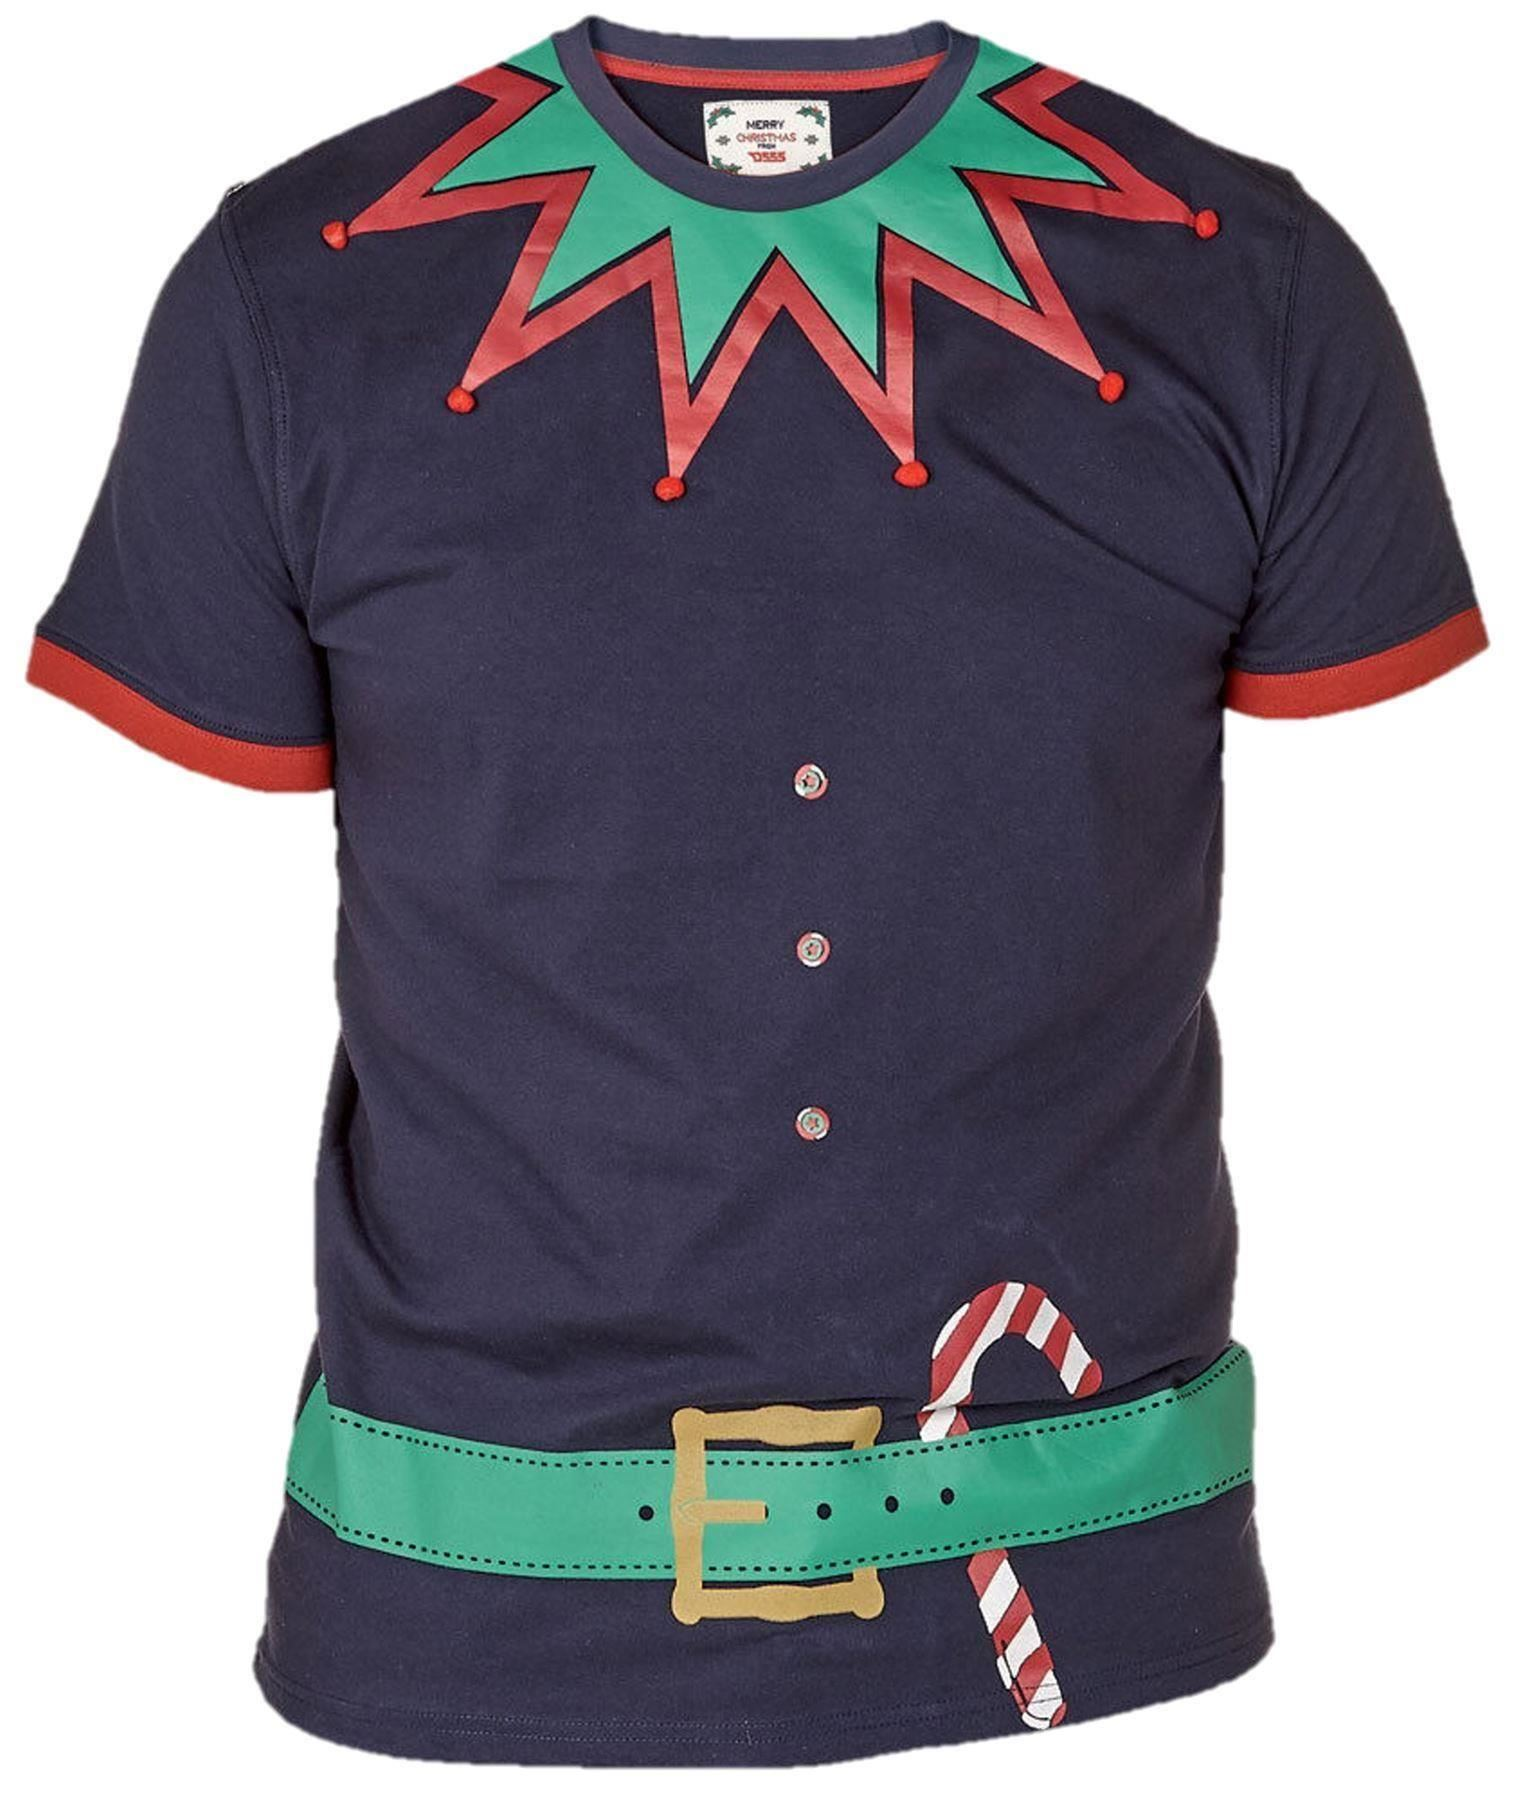 mens christmas t shirt 3xl 4xl 5xl 6xl t shirt ebay